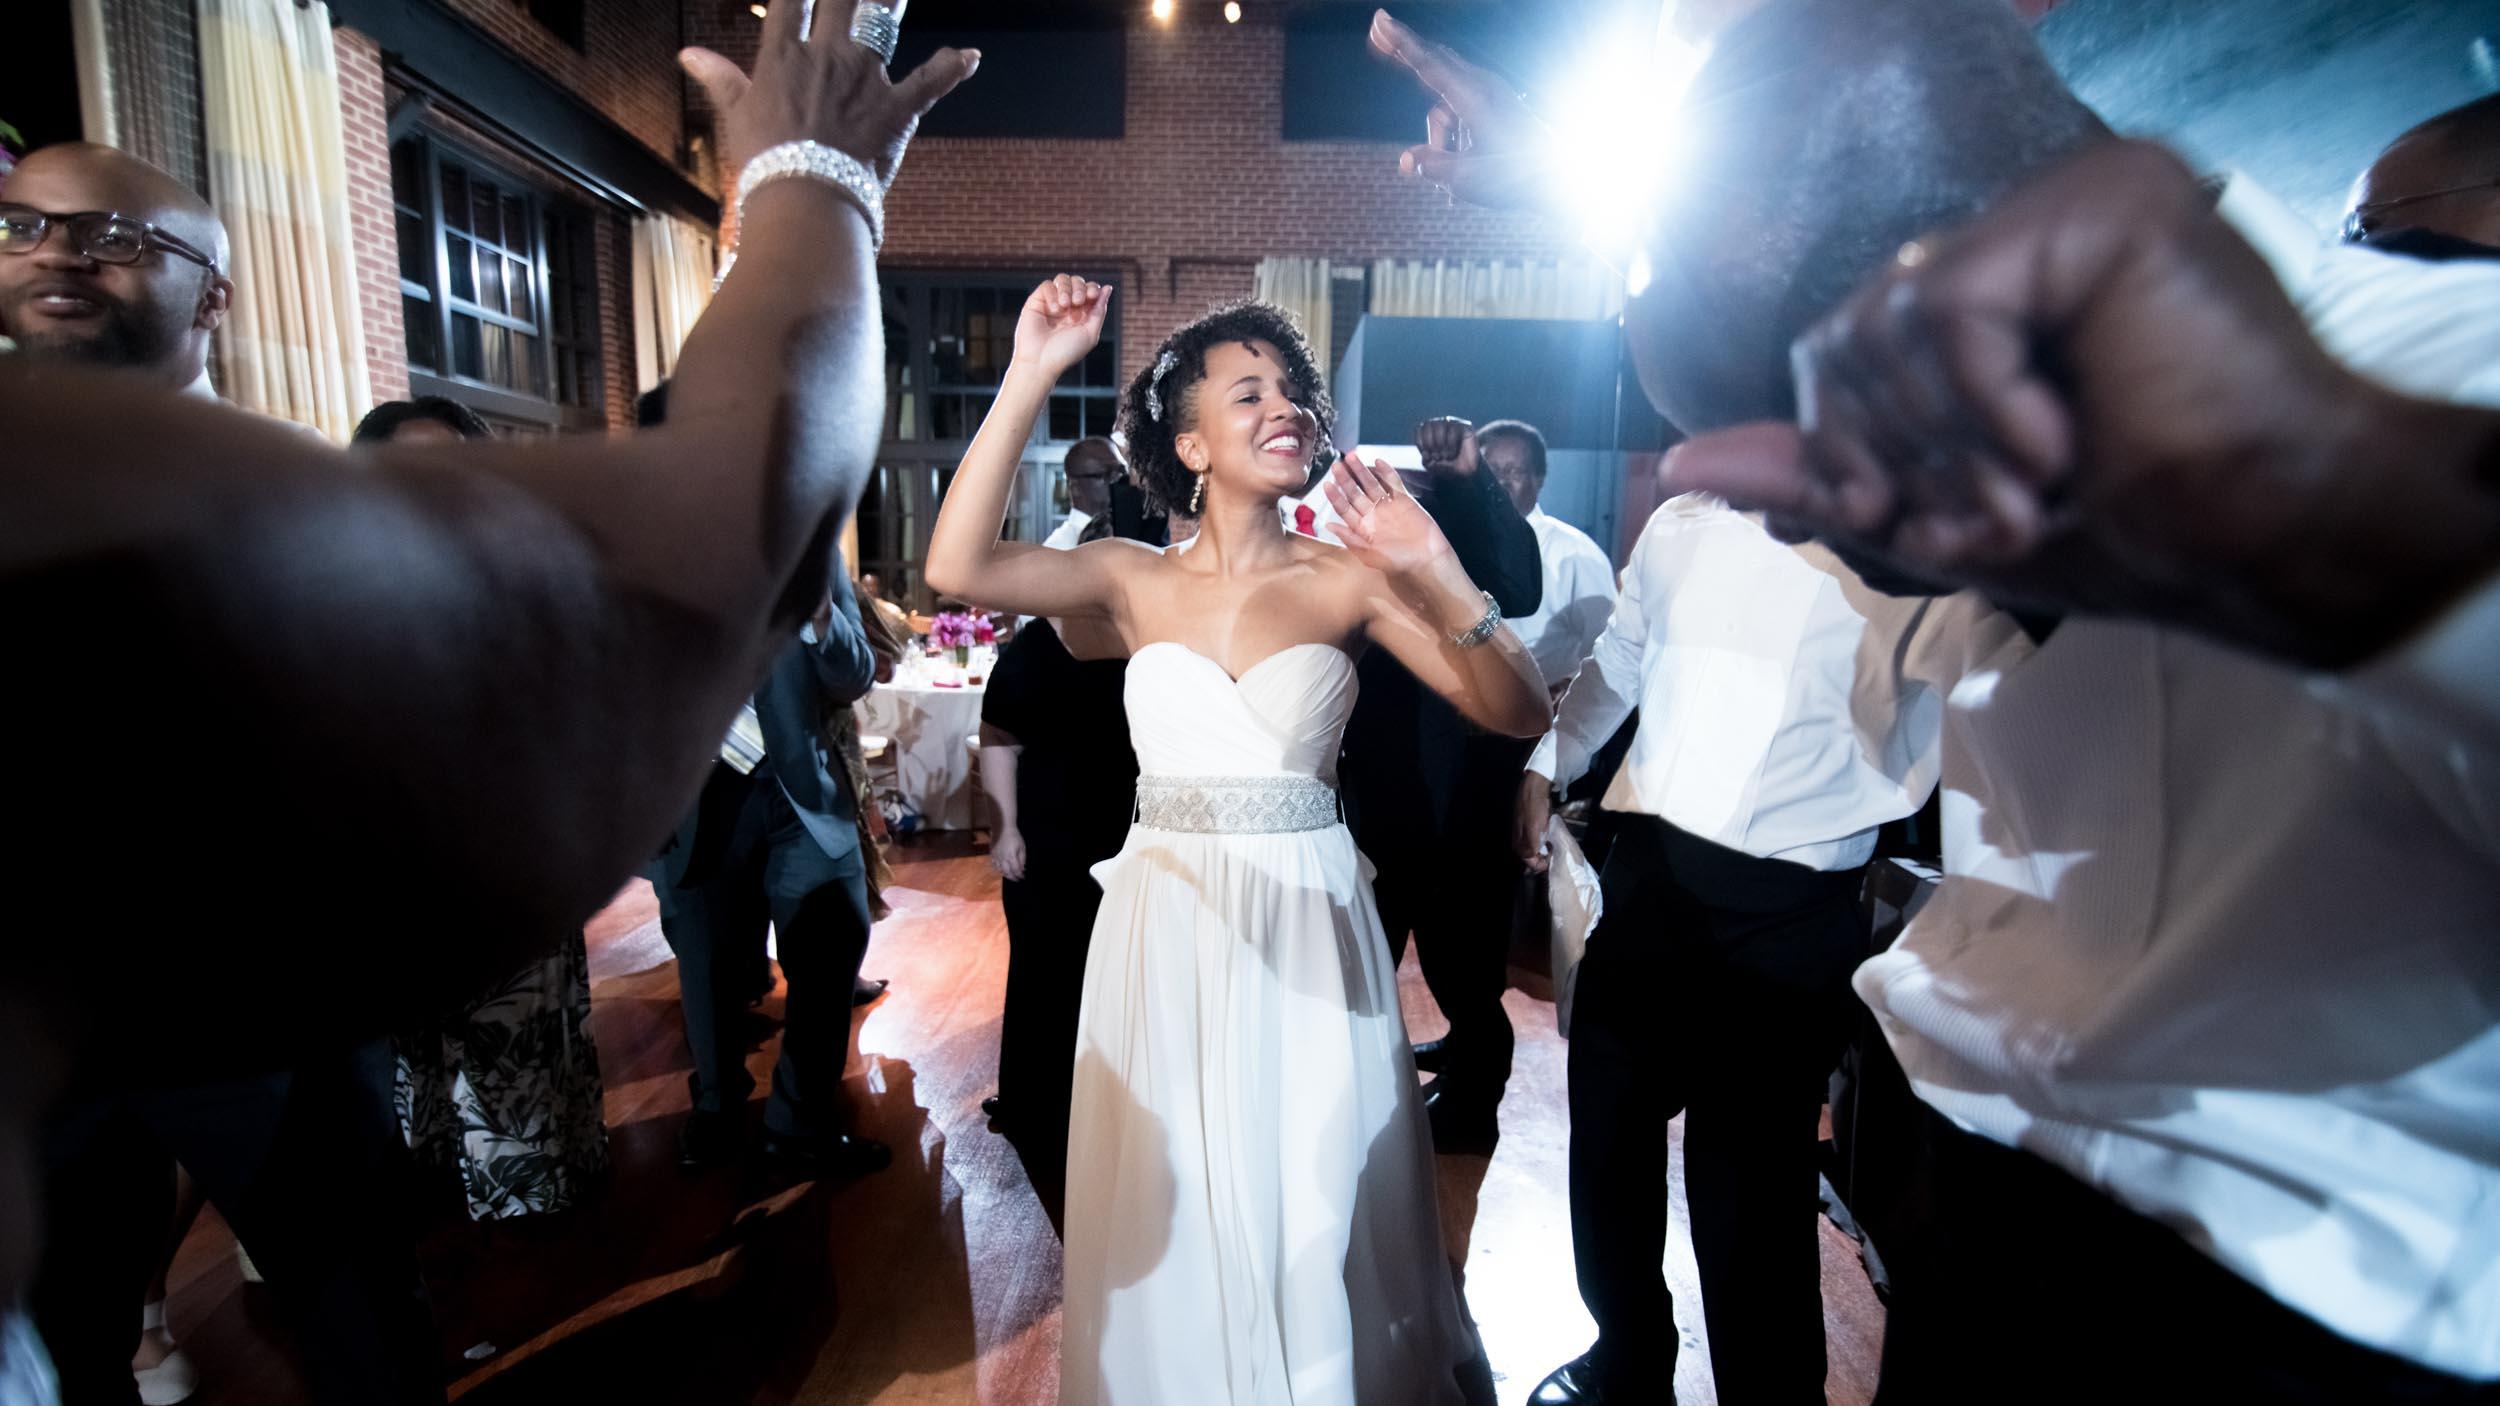 dc+metro+wedding+photographer+vadym+guliuk+photography+wedding+reception-2026.jpg